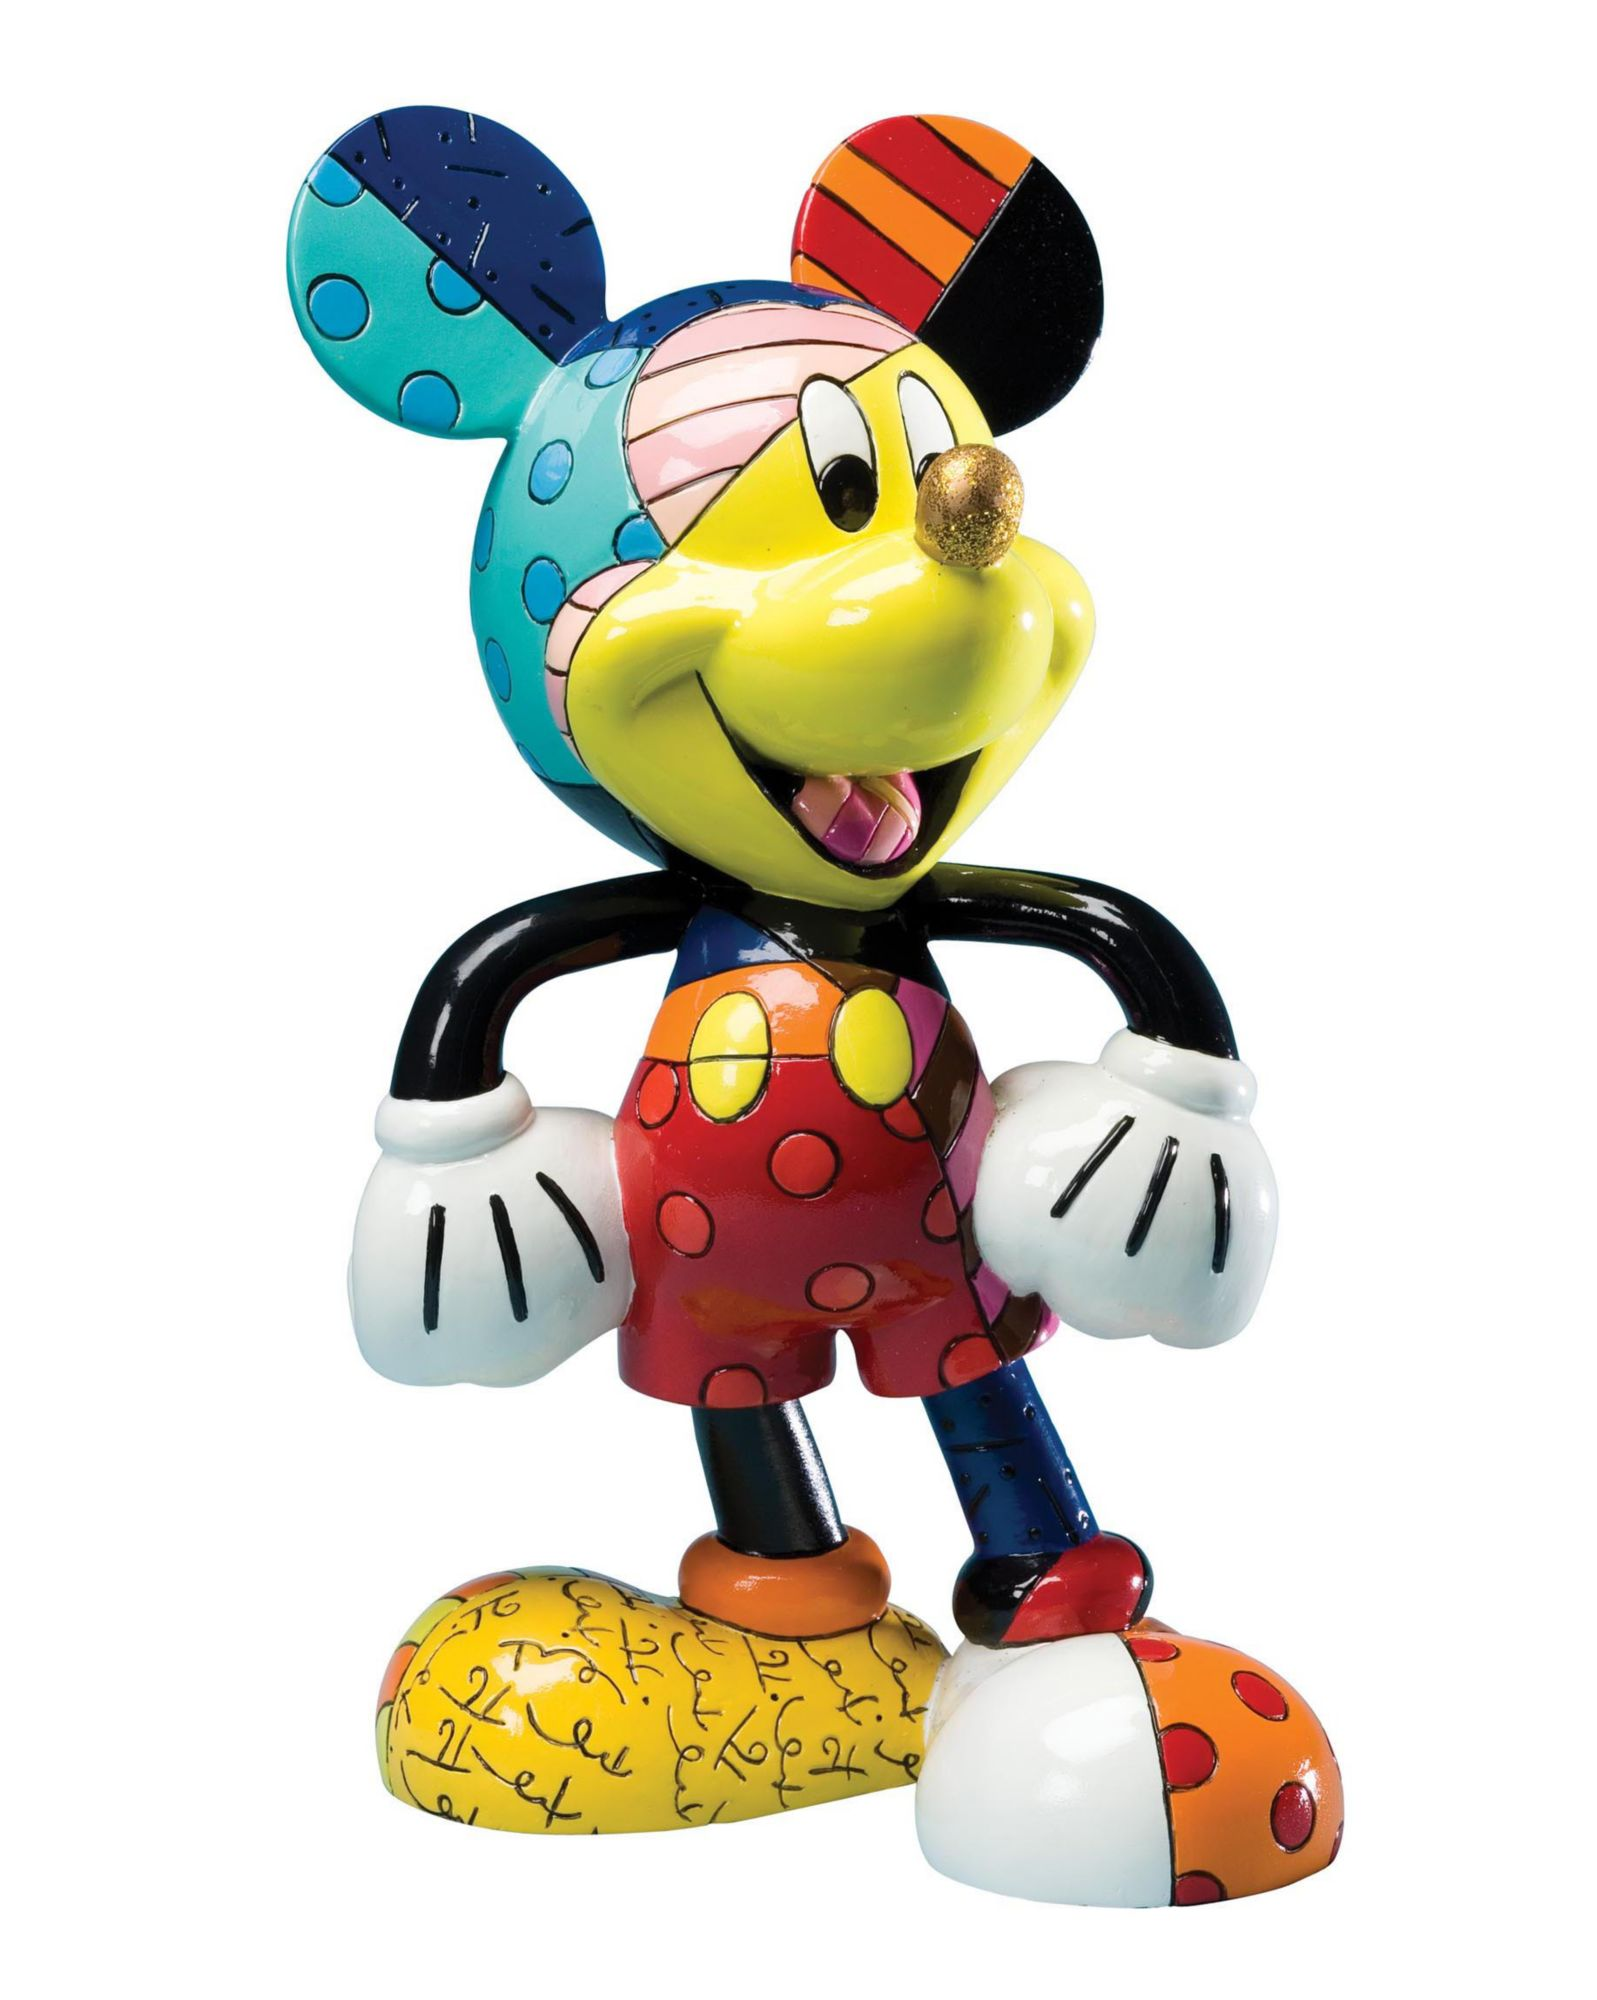 DISNEY BY BRITTO Disney by Britto Figur PopArt, »Mickey Mouse«